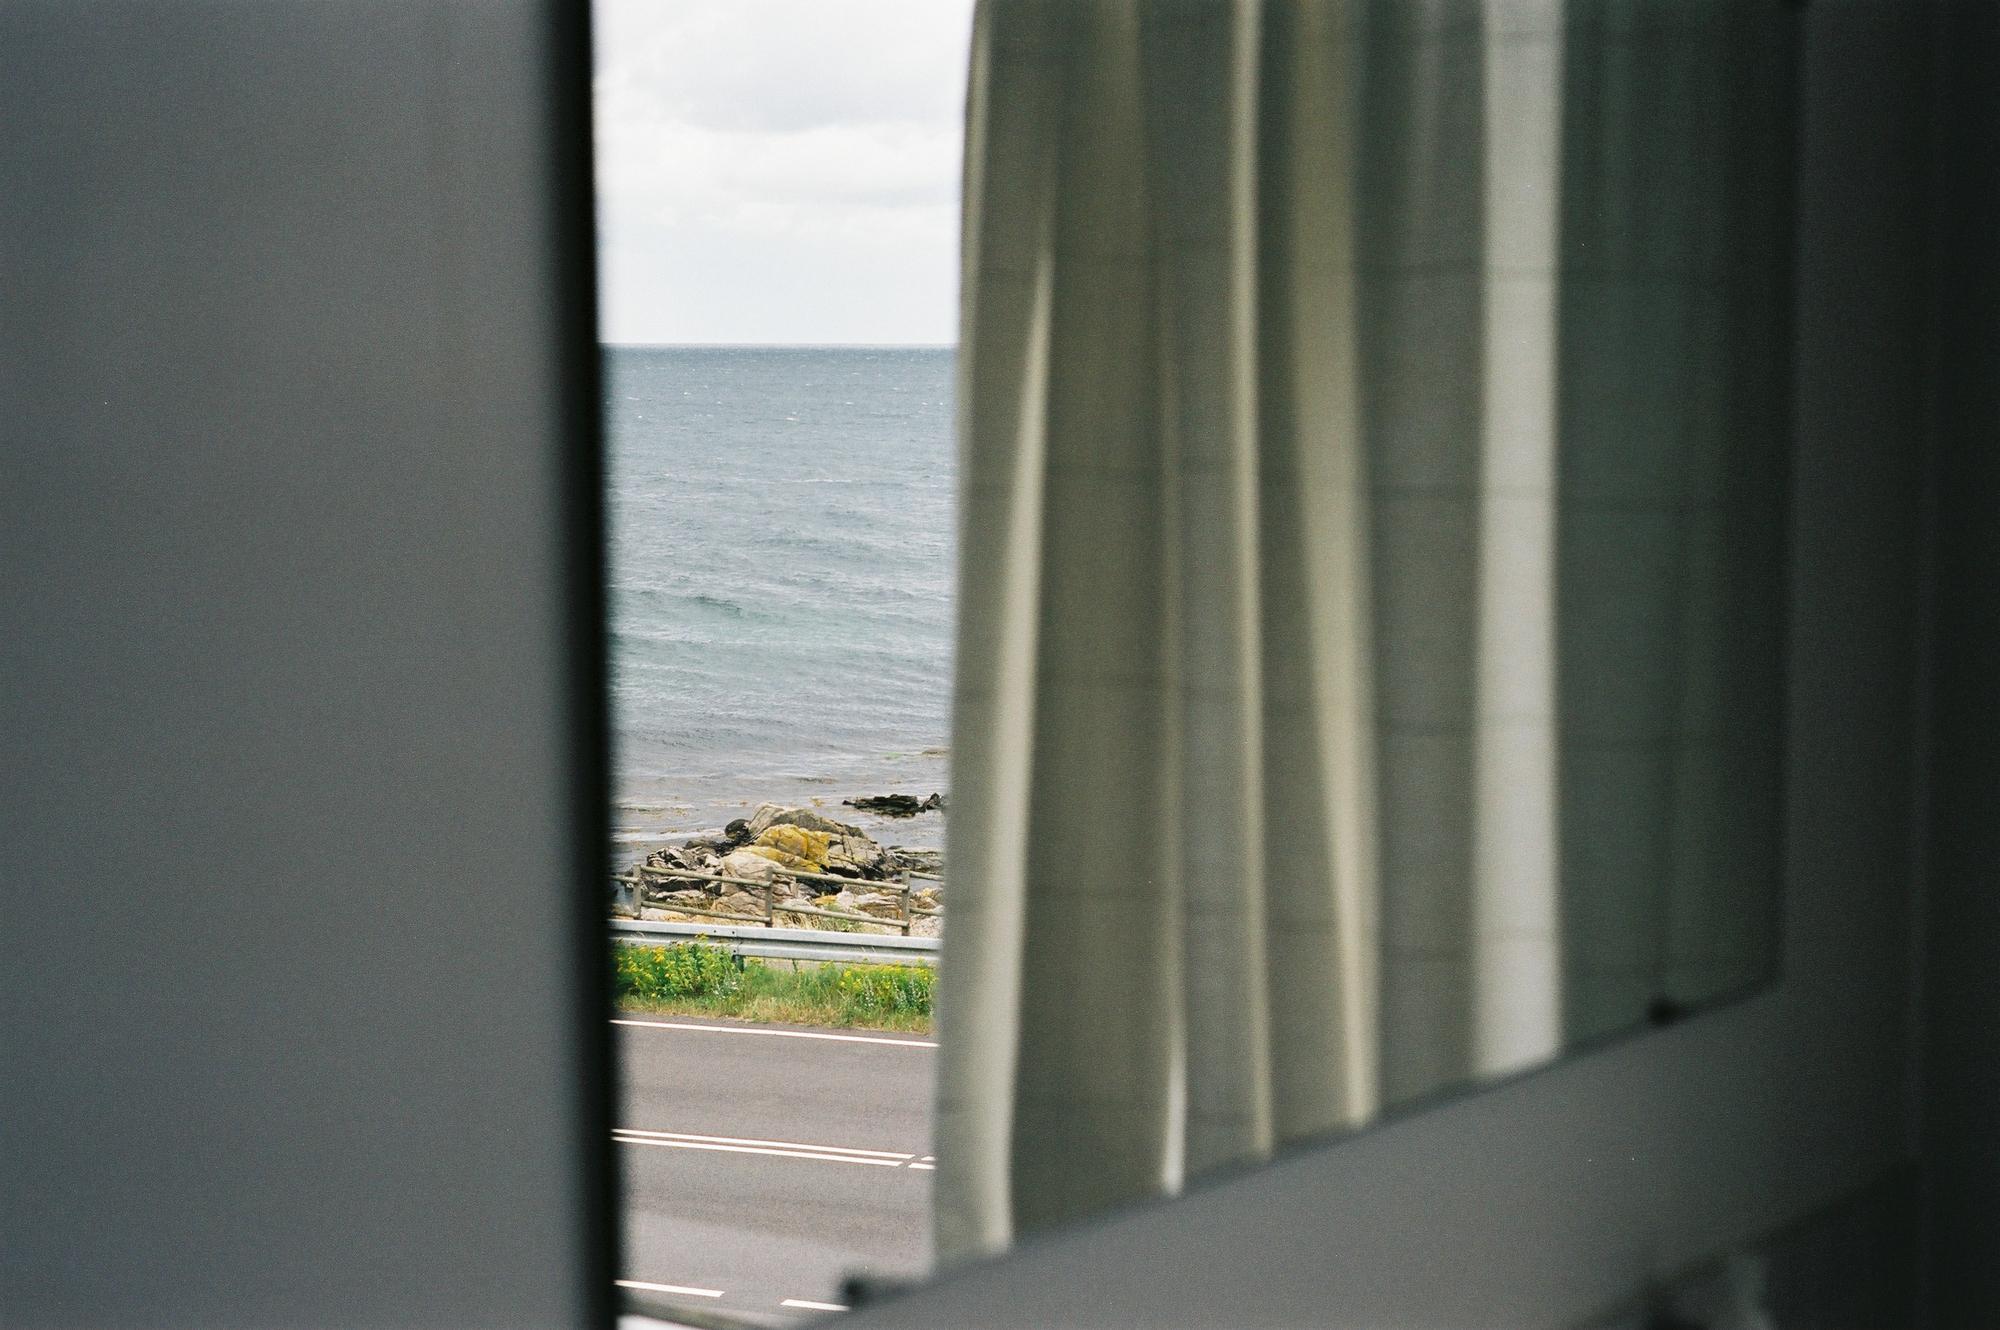 Photo: Alex Yates Bornholm, Denmark, 2013